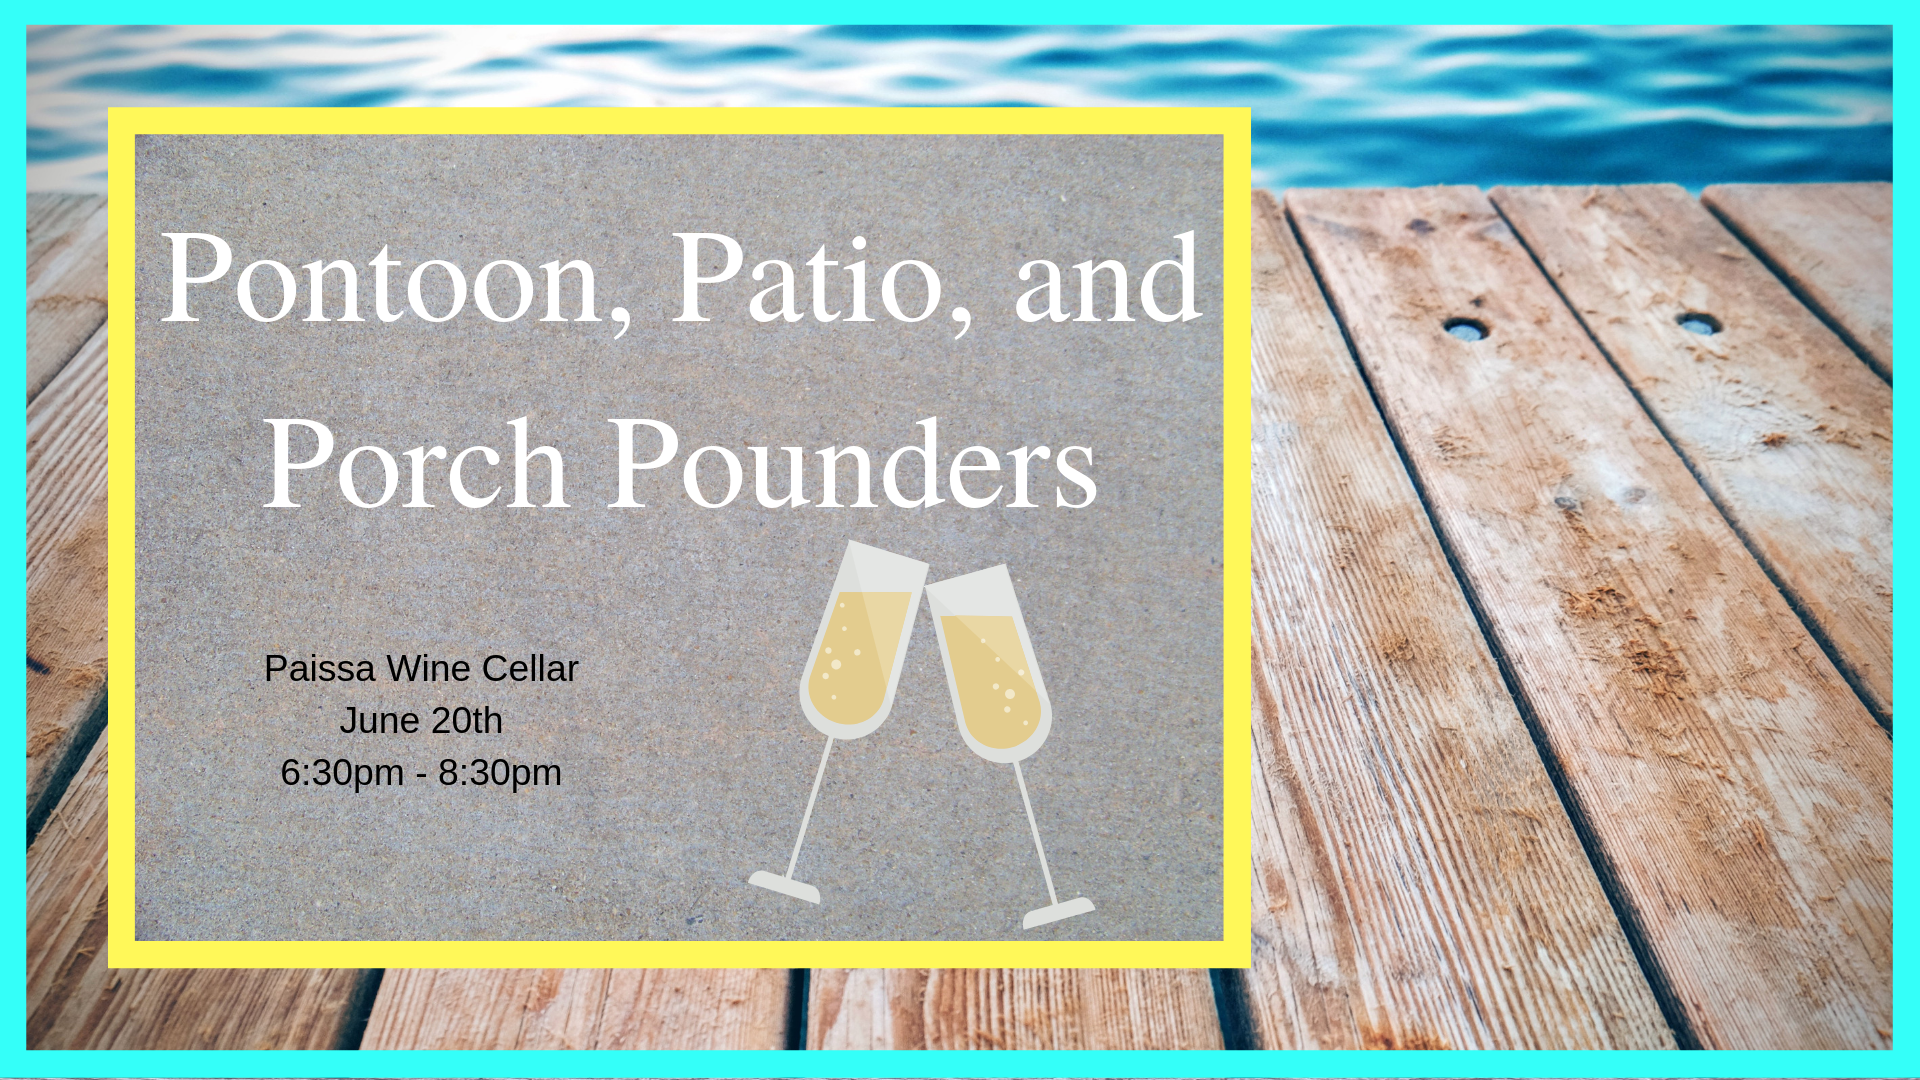 Wine Tasting: Pontoon, Patio, and Porch Pounders